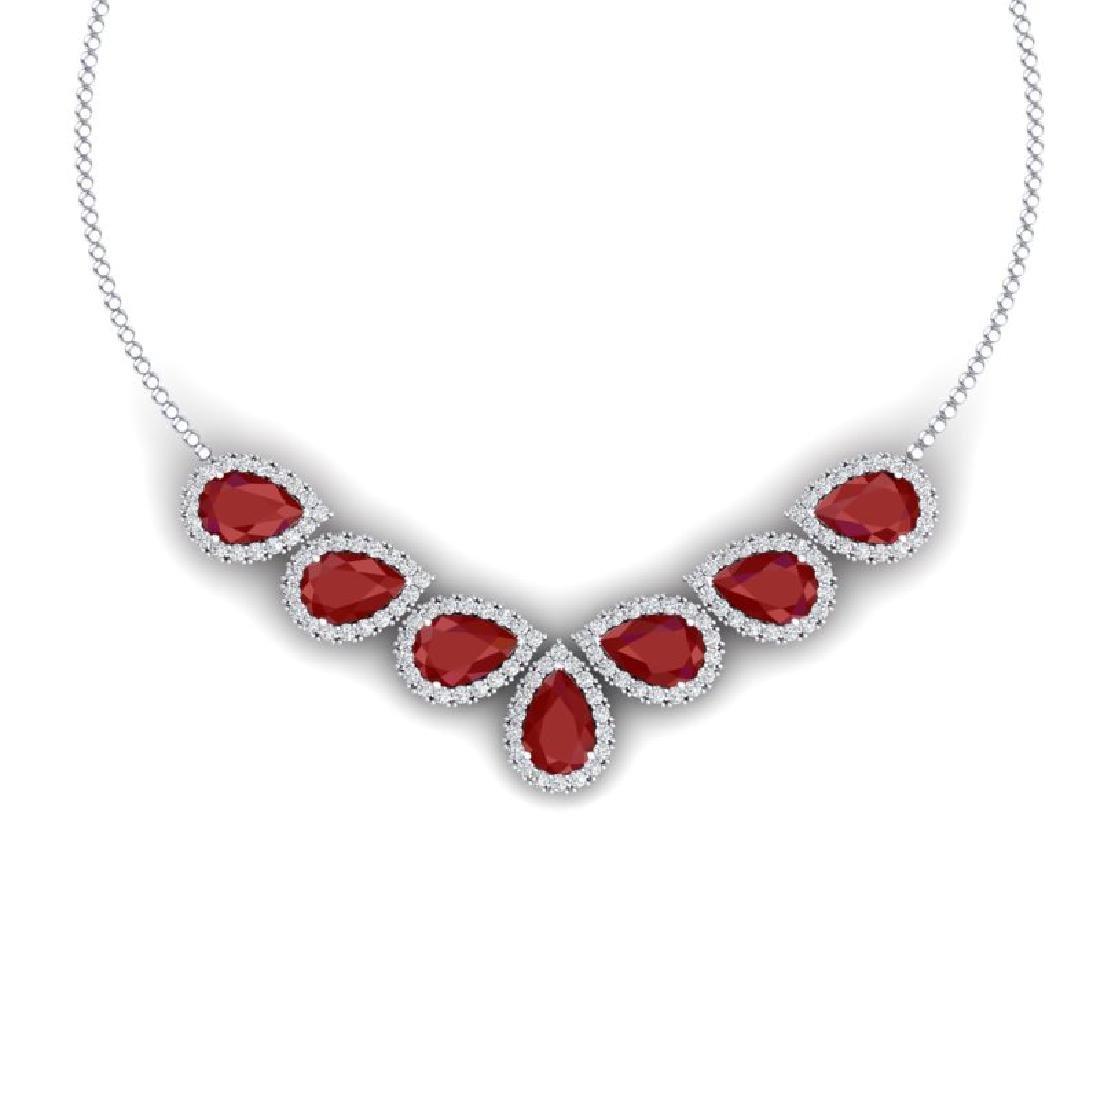 34.72 CTW Royalty Ruby & VS Diamond Necklace 18K White